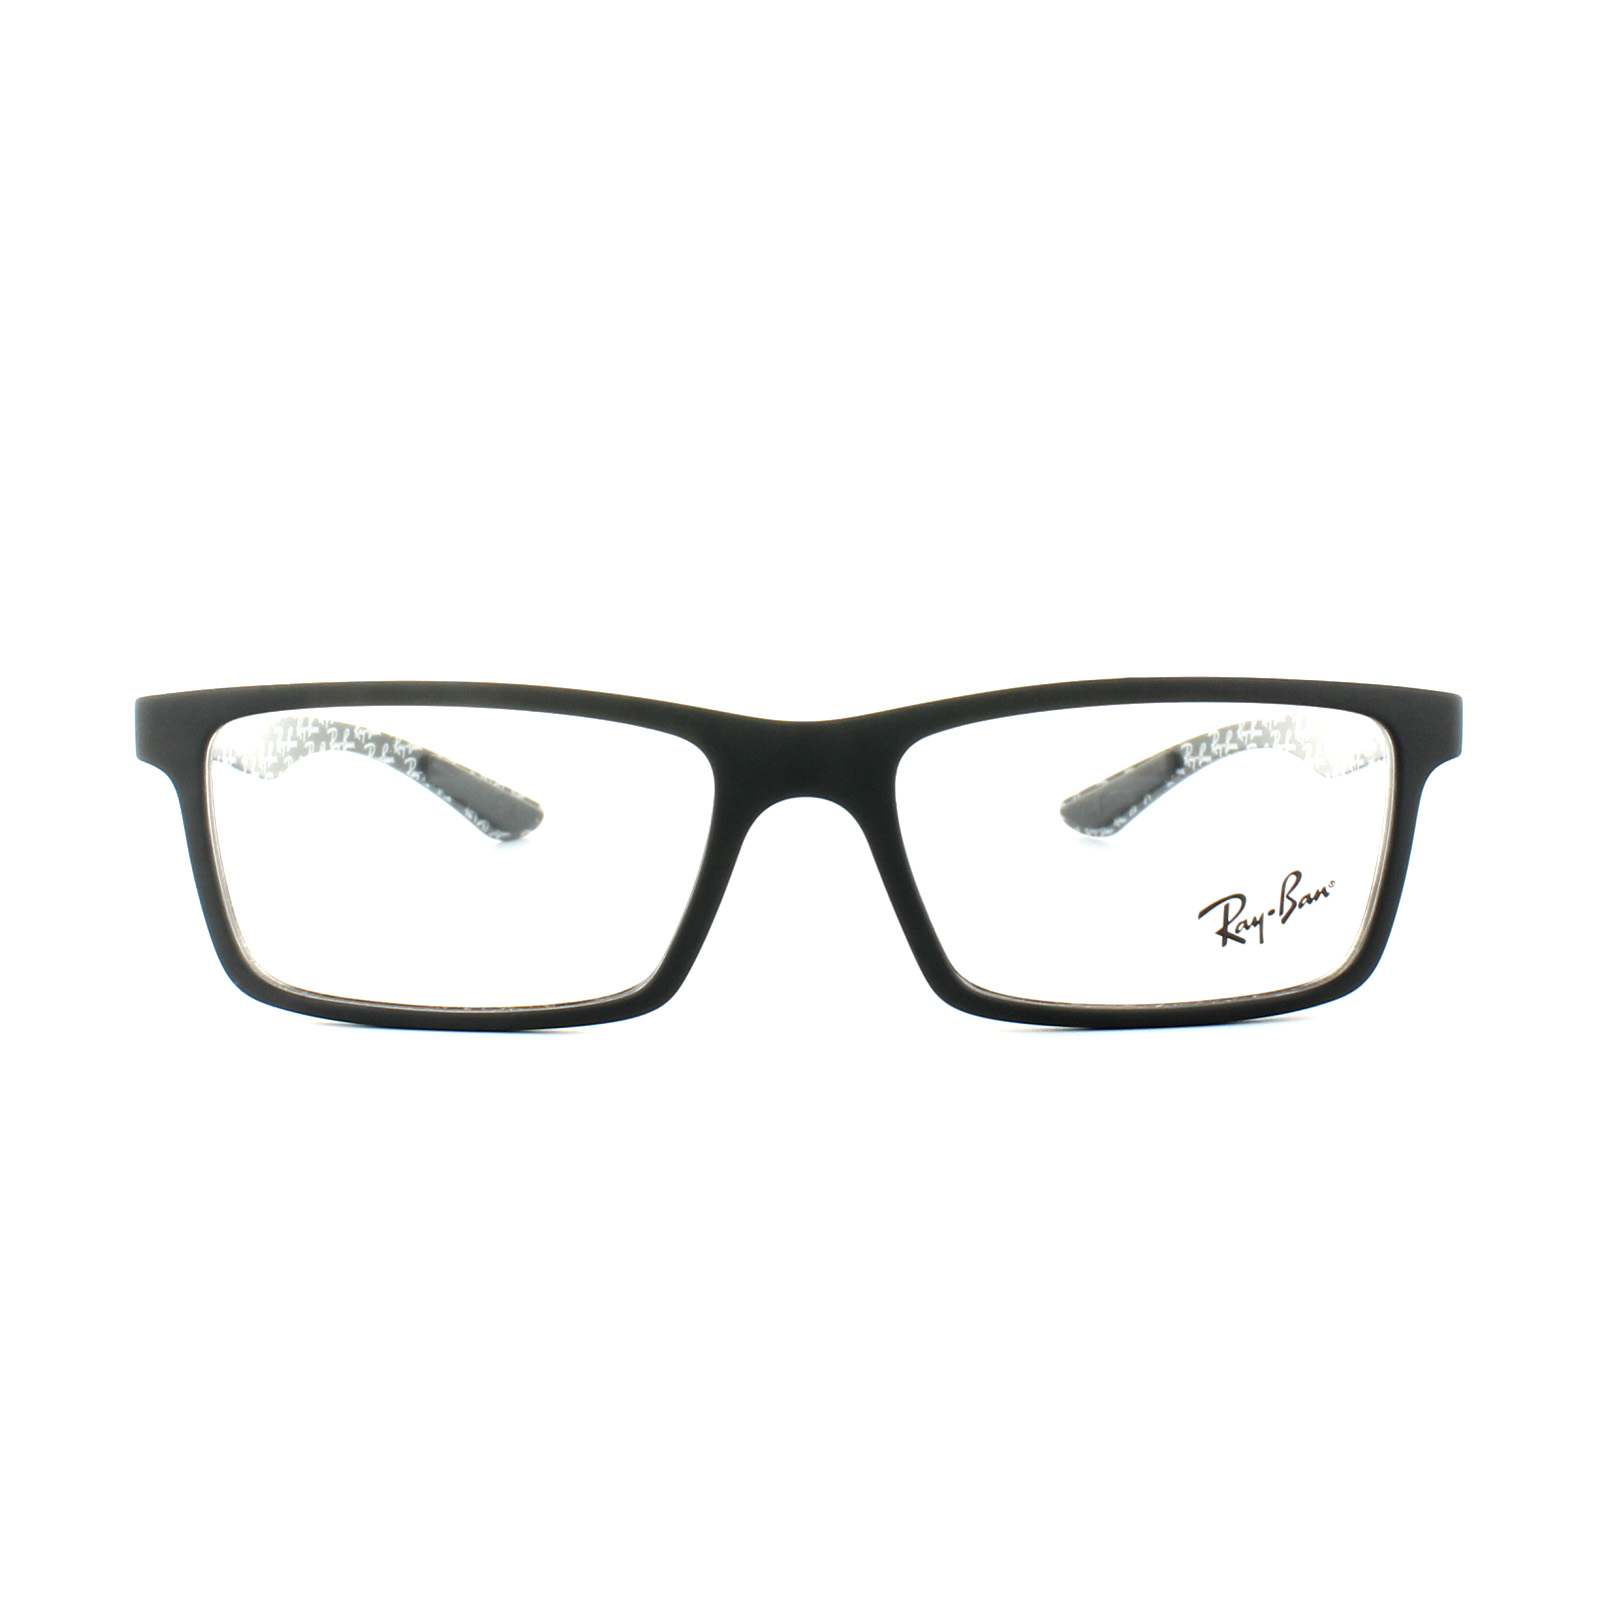 8ec71c22c6e39 Sentinel Ray-Ban Glasses Frames 8901 5263 Demi Gloss Black Mens 53mm